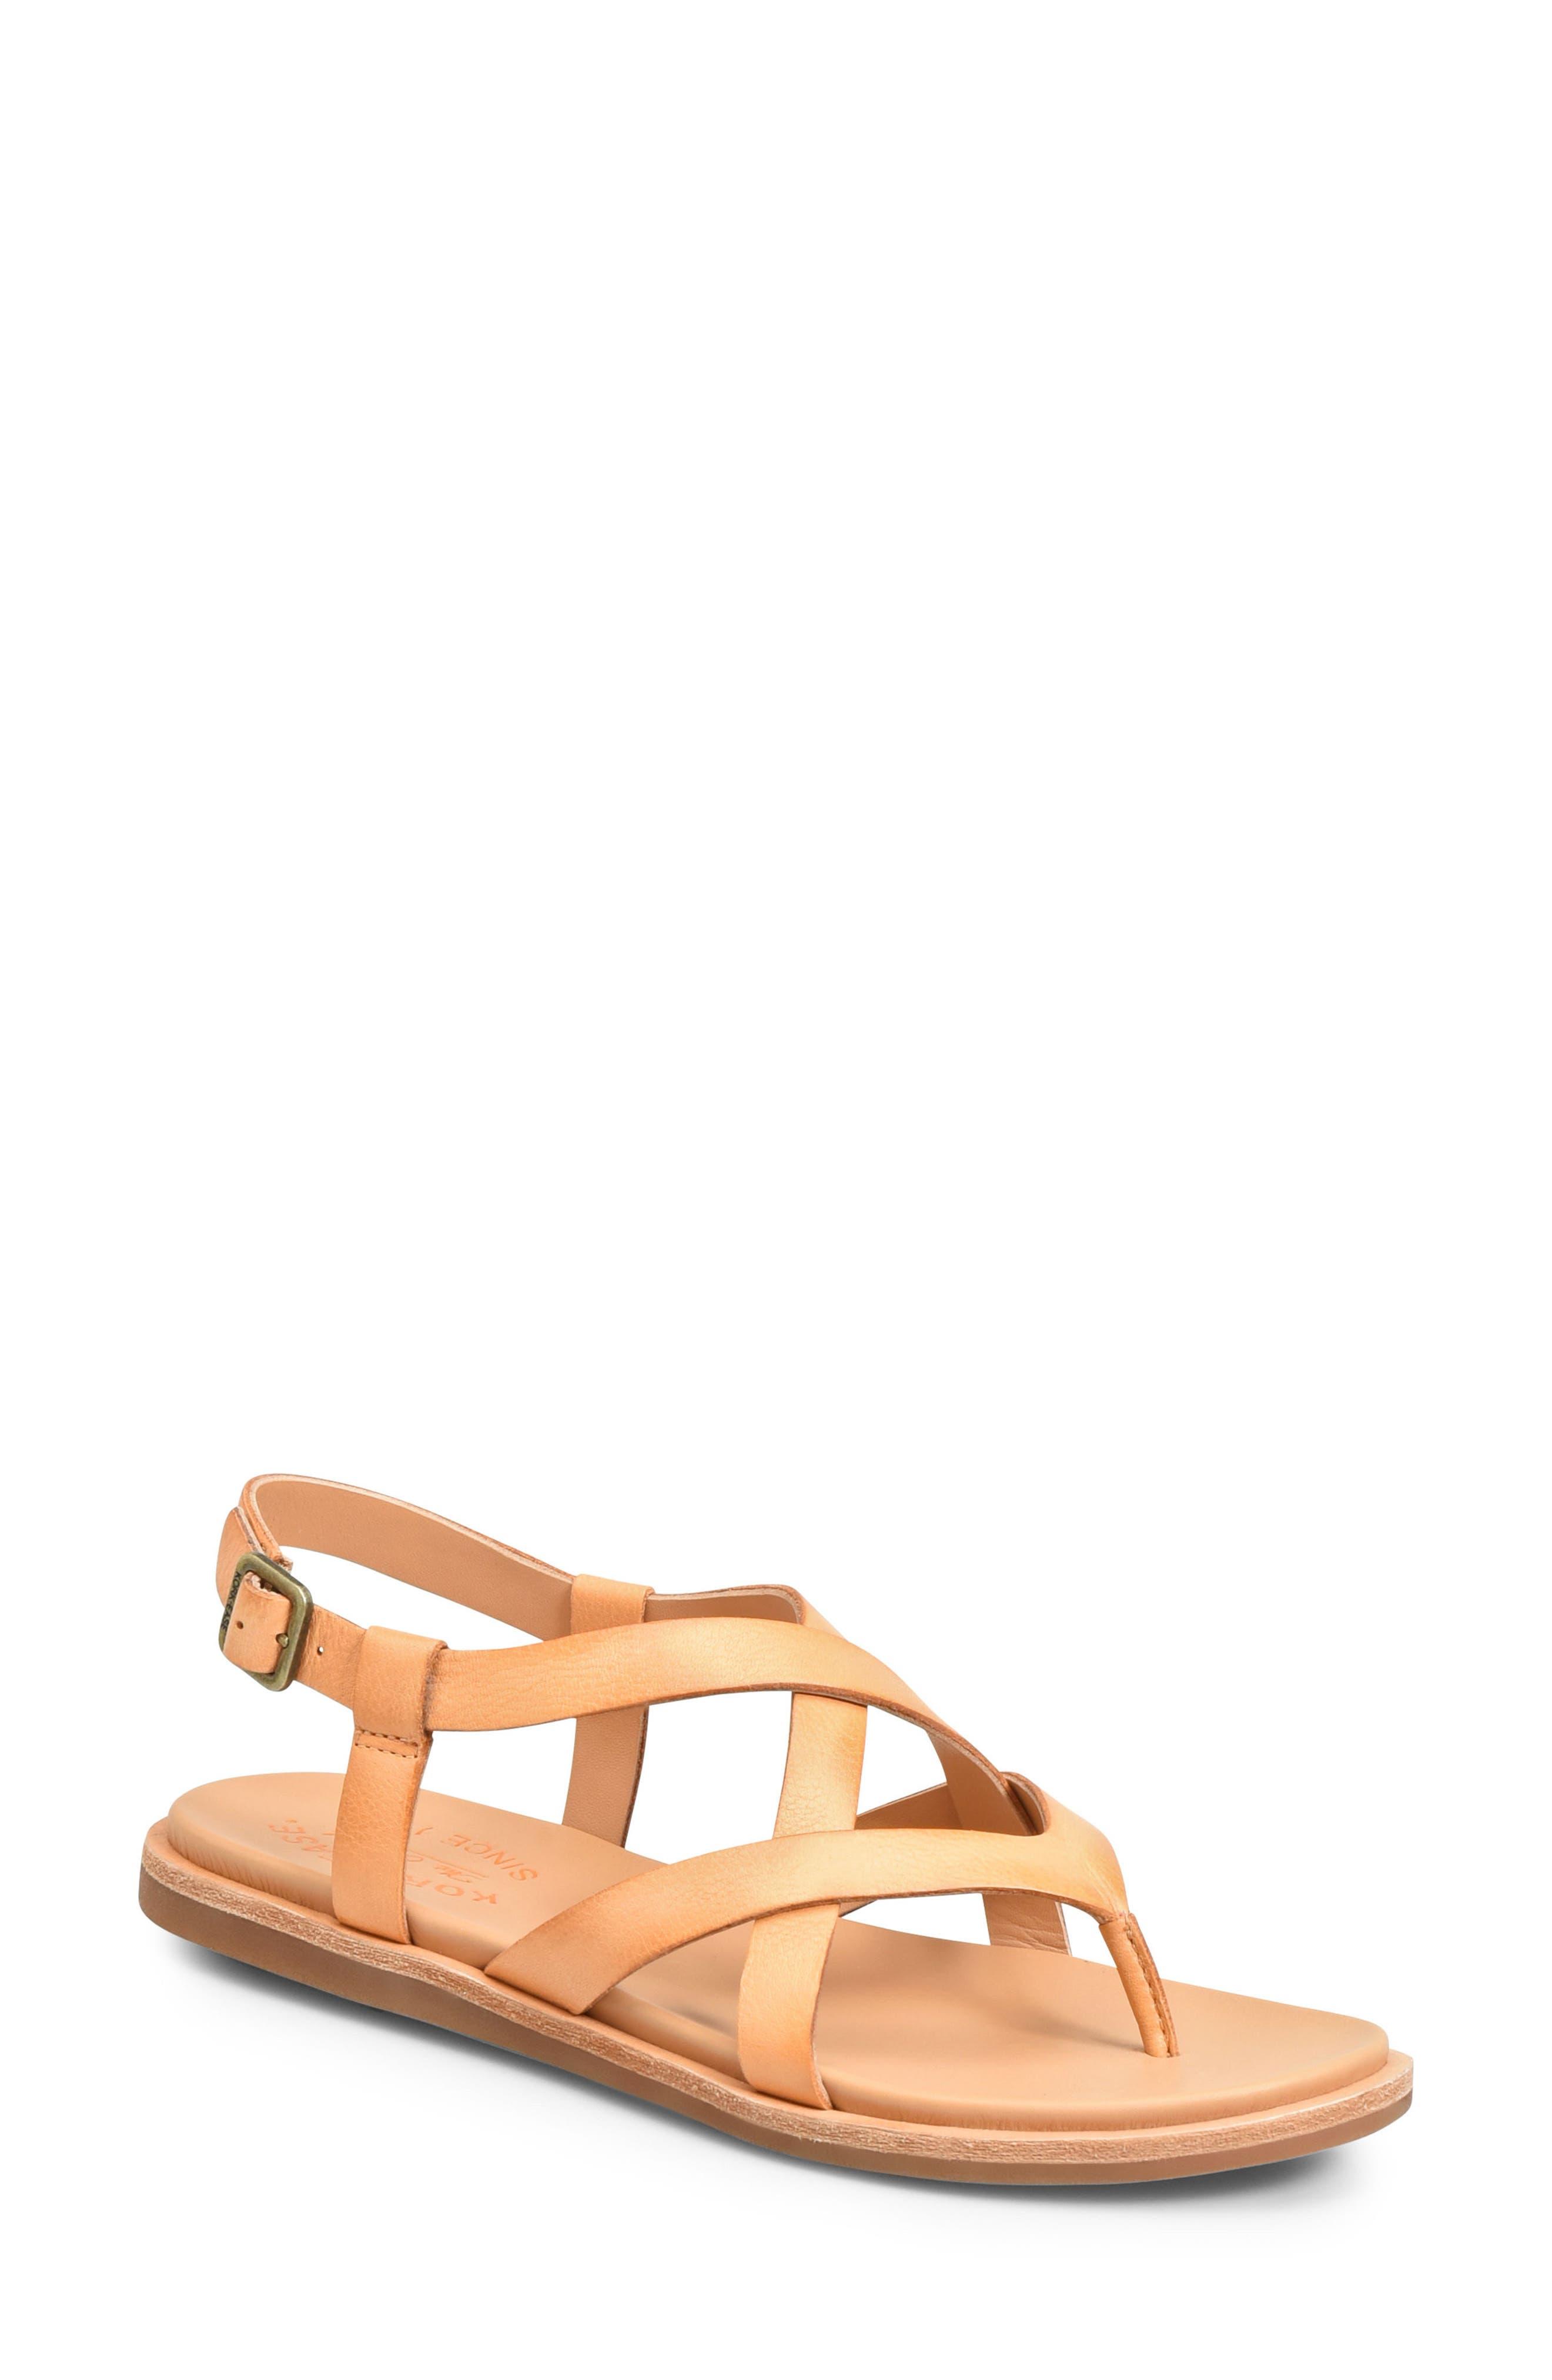 Kork-Ease Yarbrough Sandal, Orange